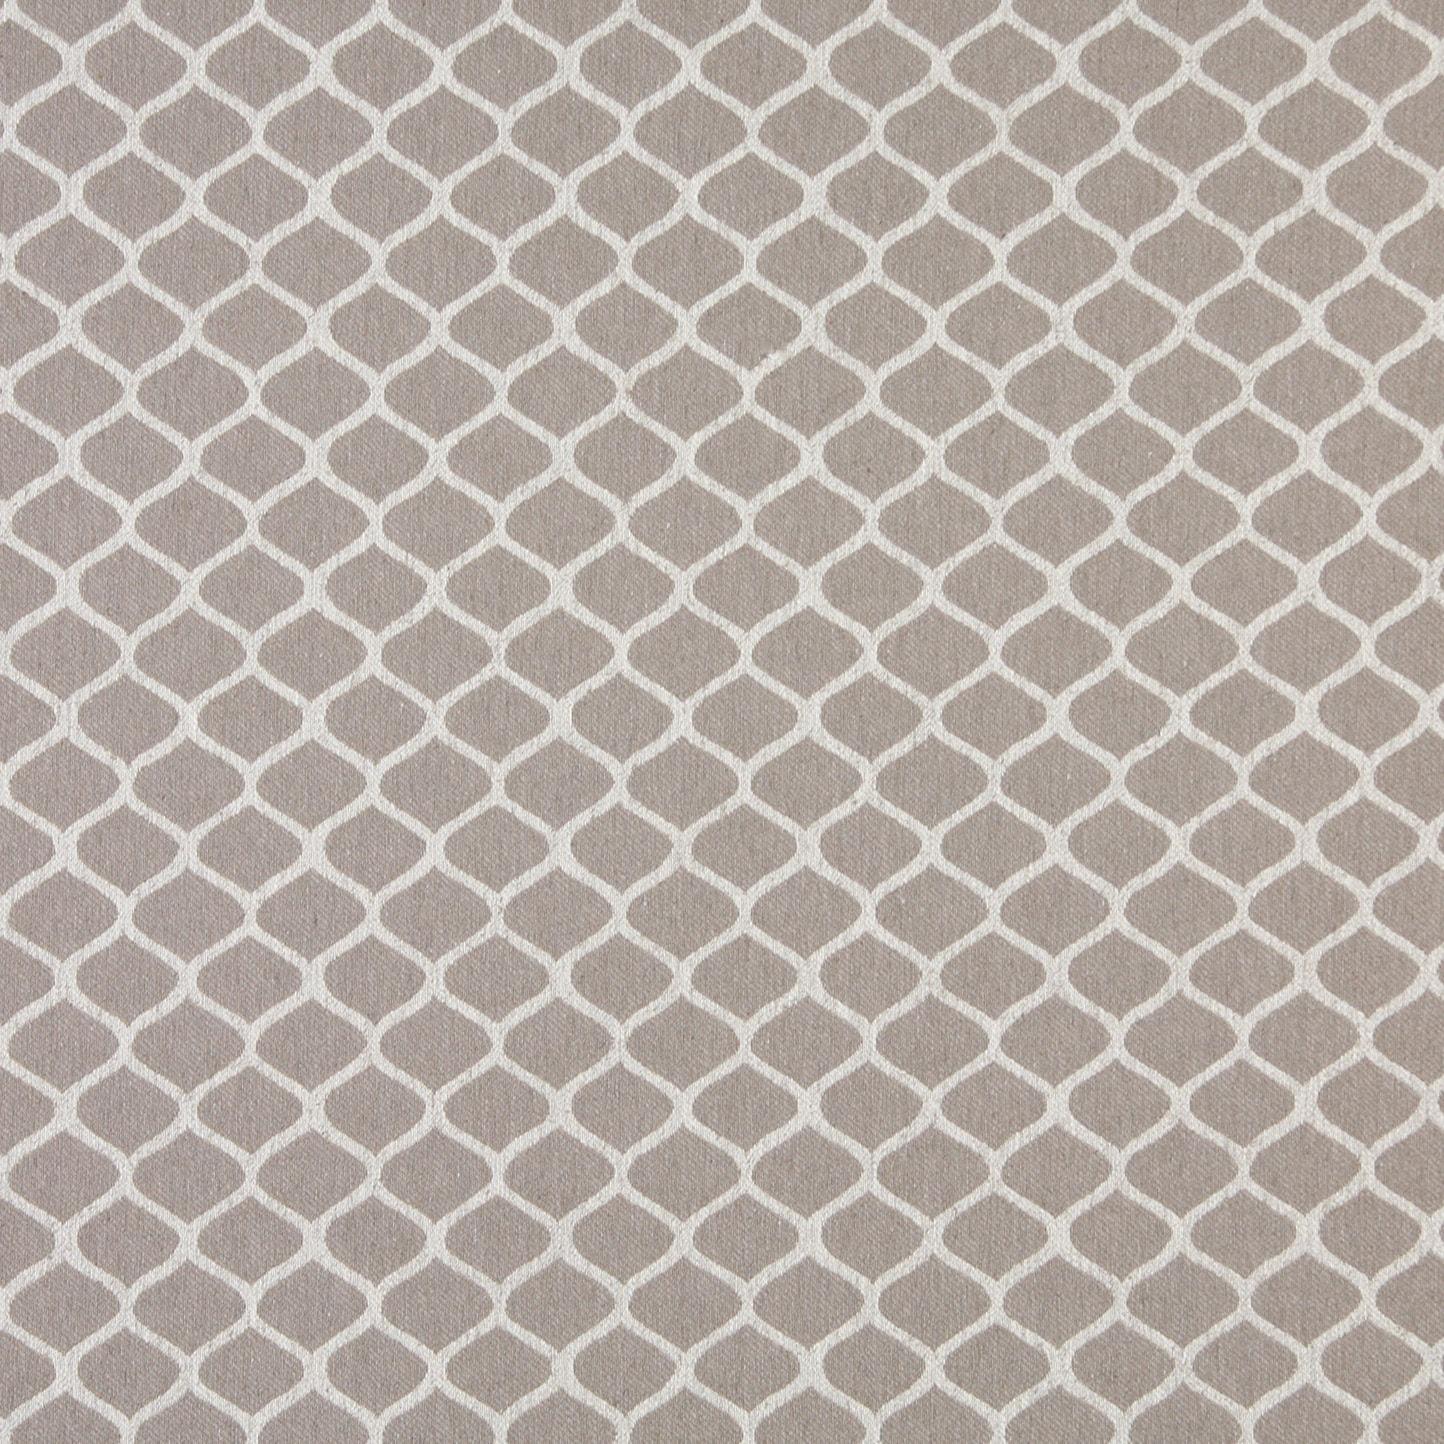 Shop A0008f Grey Off White Modern Geometric Upholstery Fabric Free